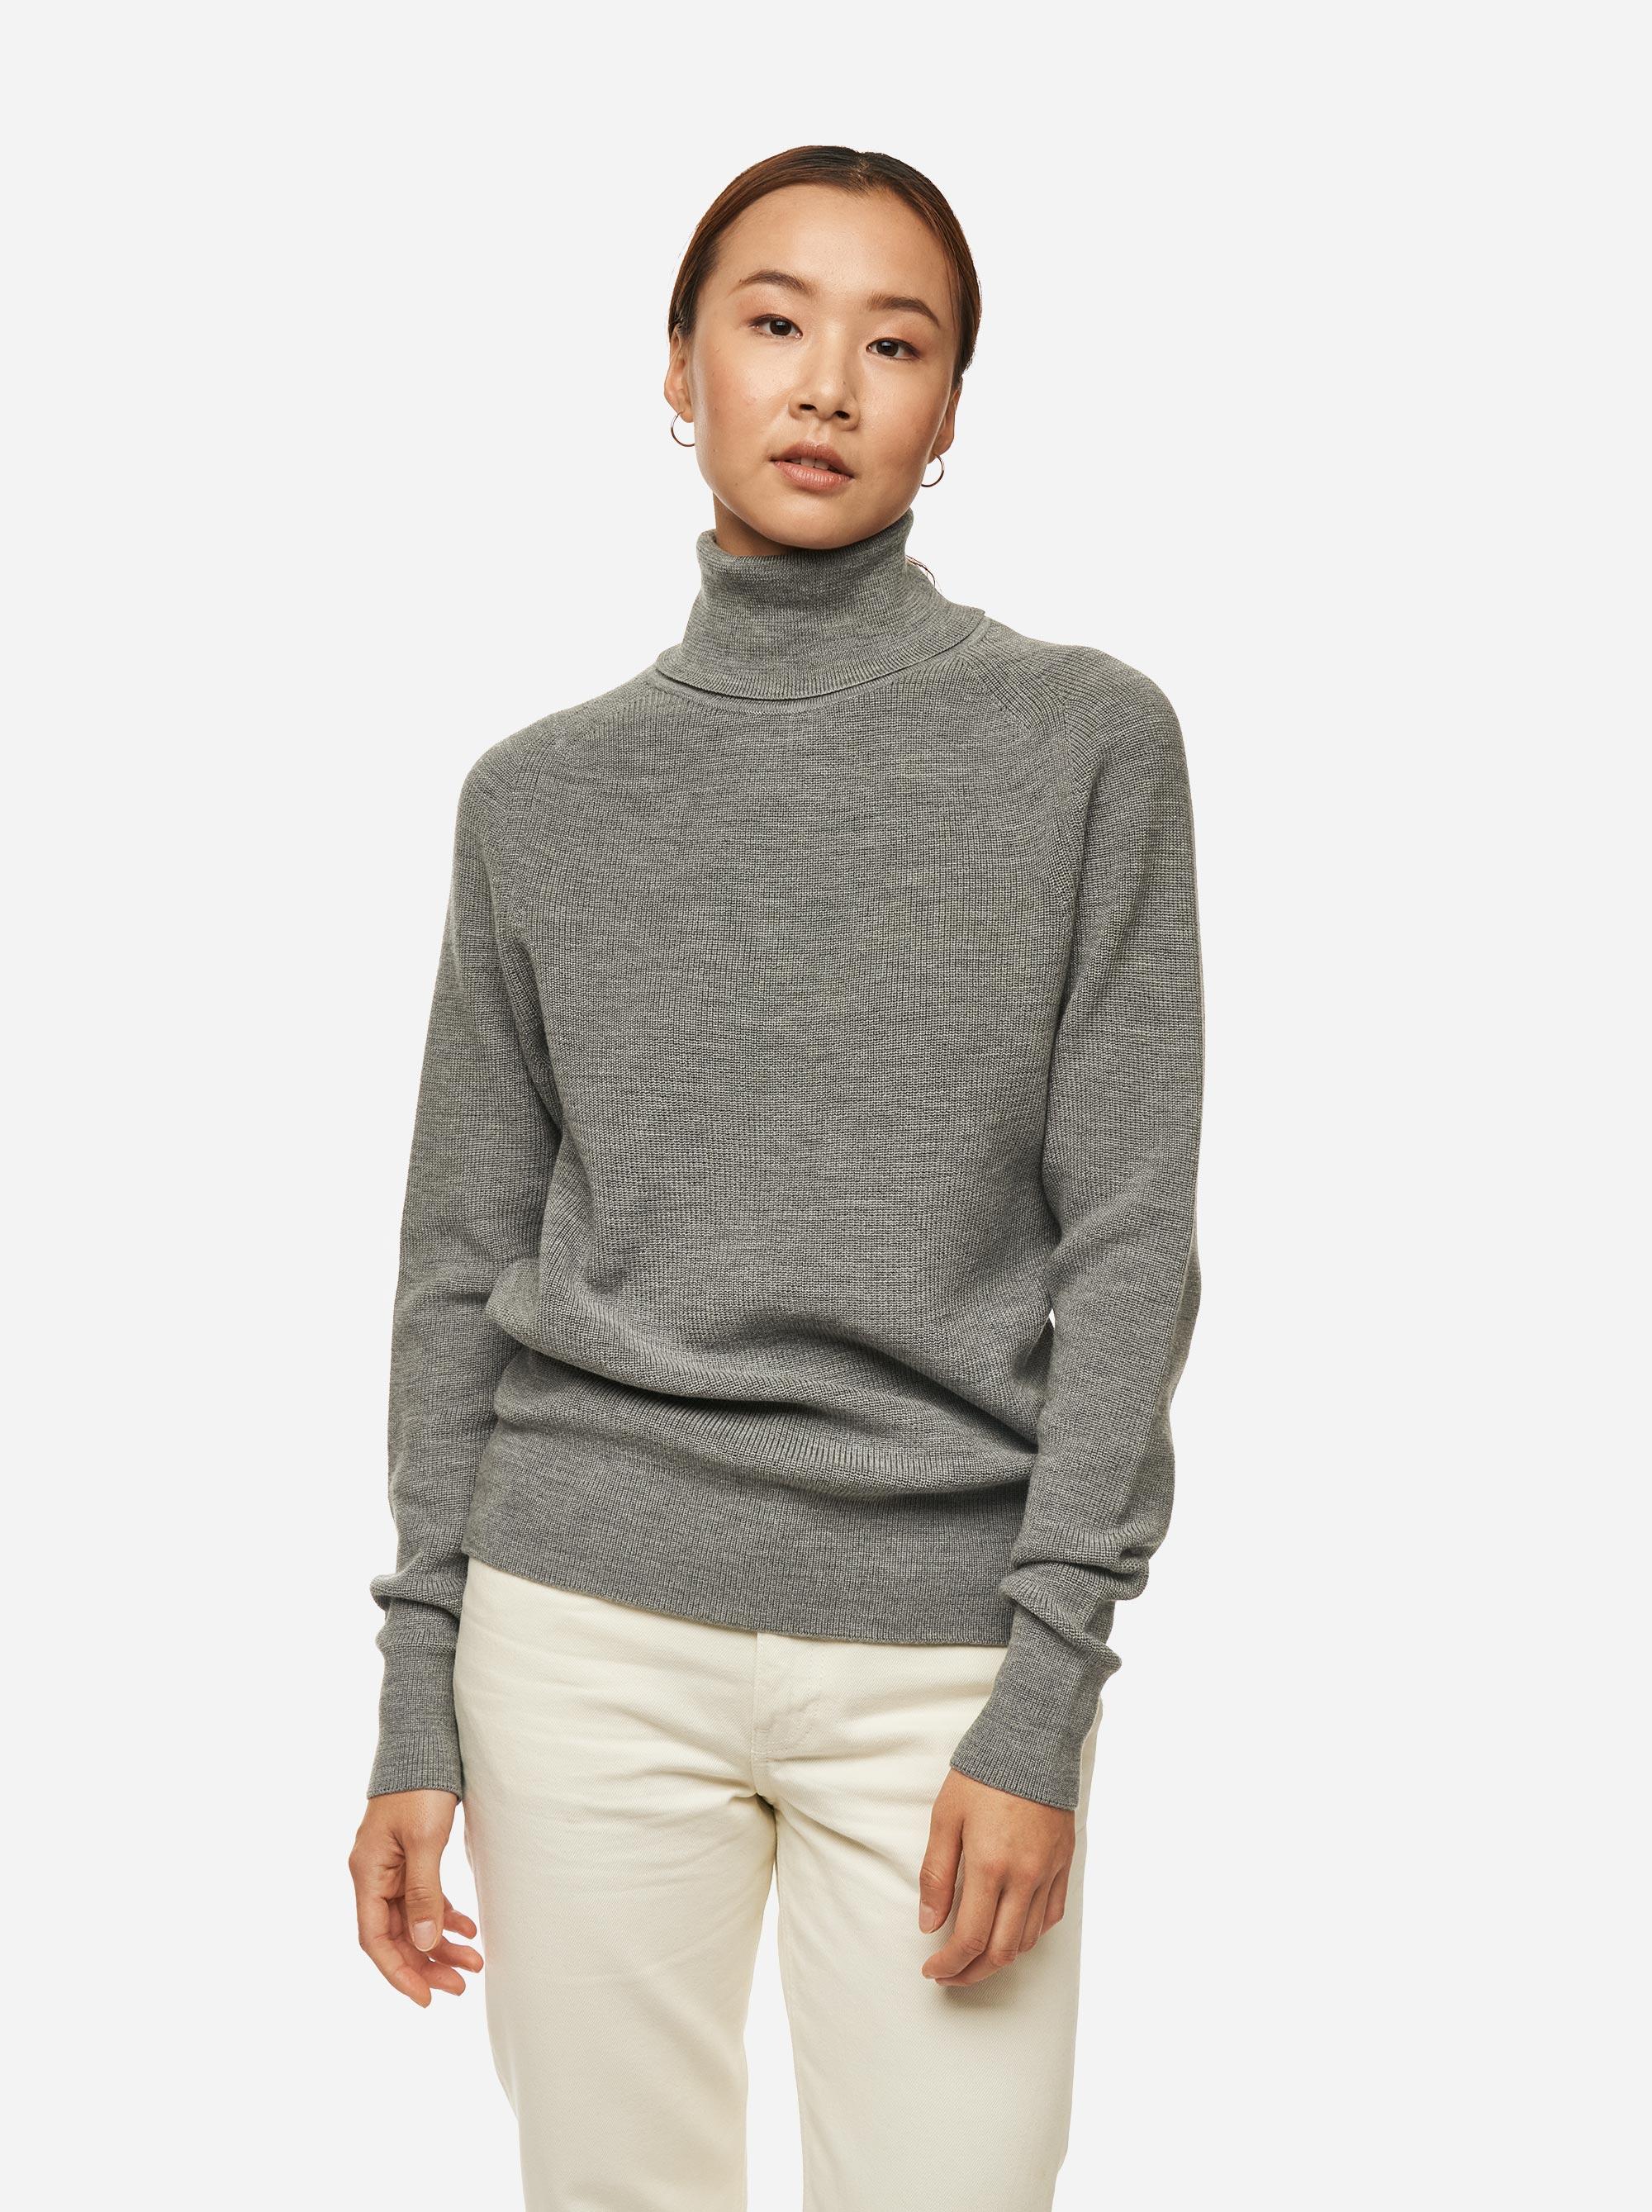 Teym - Turtleneck - The Merino Sweater - Women - Grey - 2